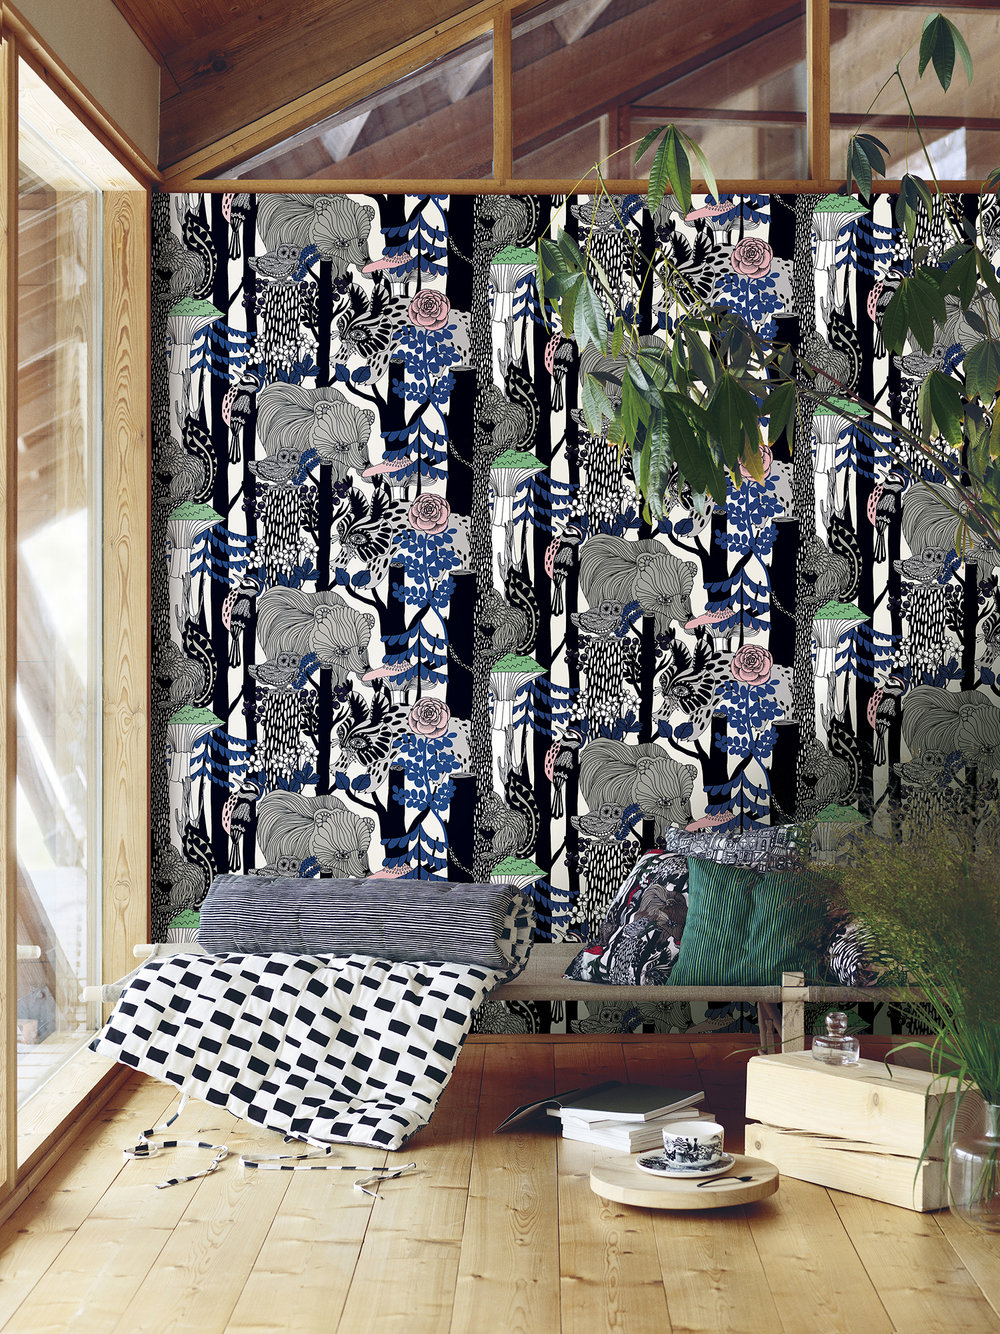 Marimekko Pikkuveljekset Muted Blue Wallpaper - Product code: 23340